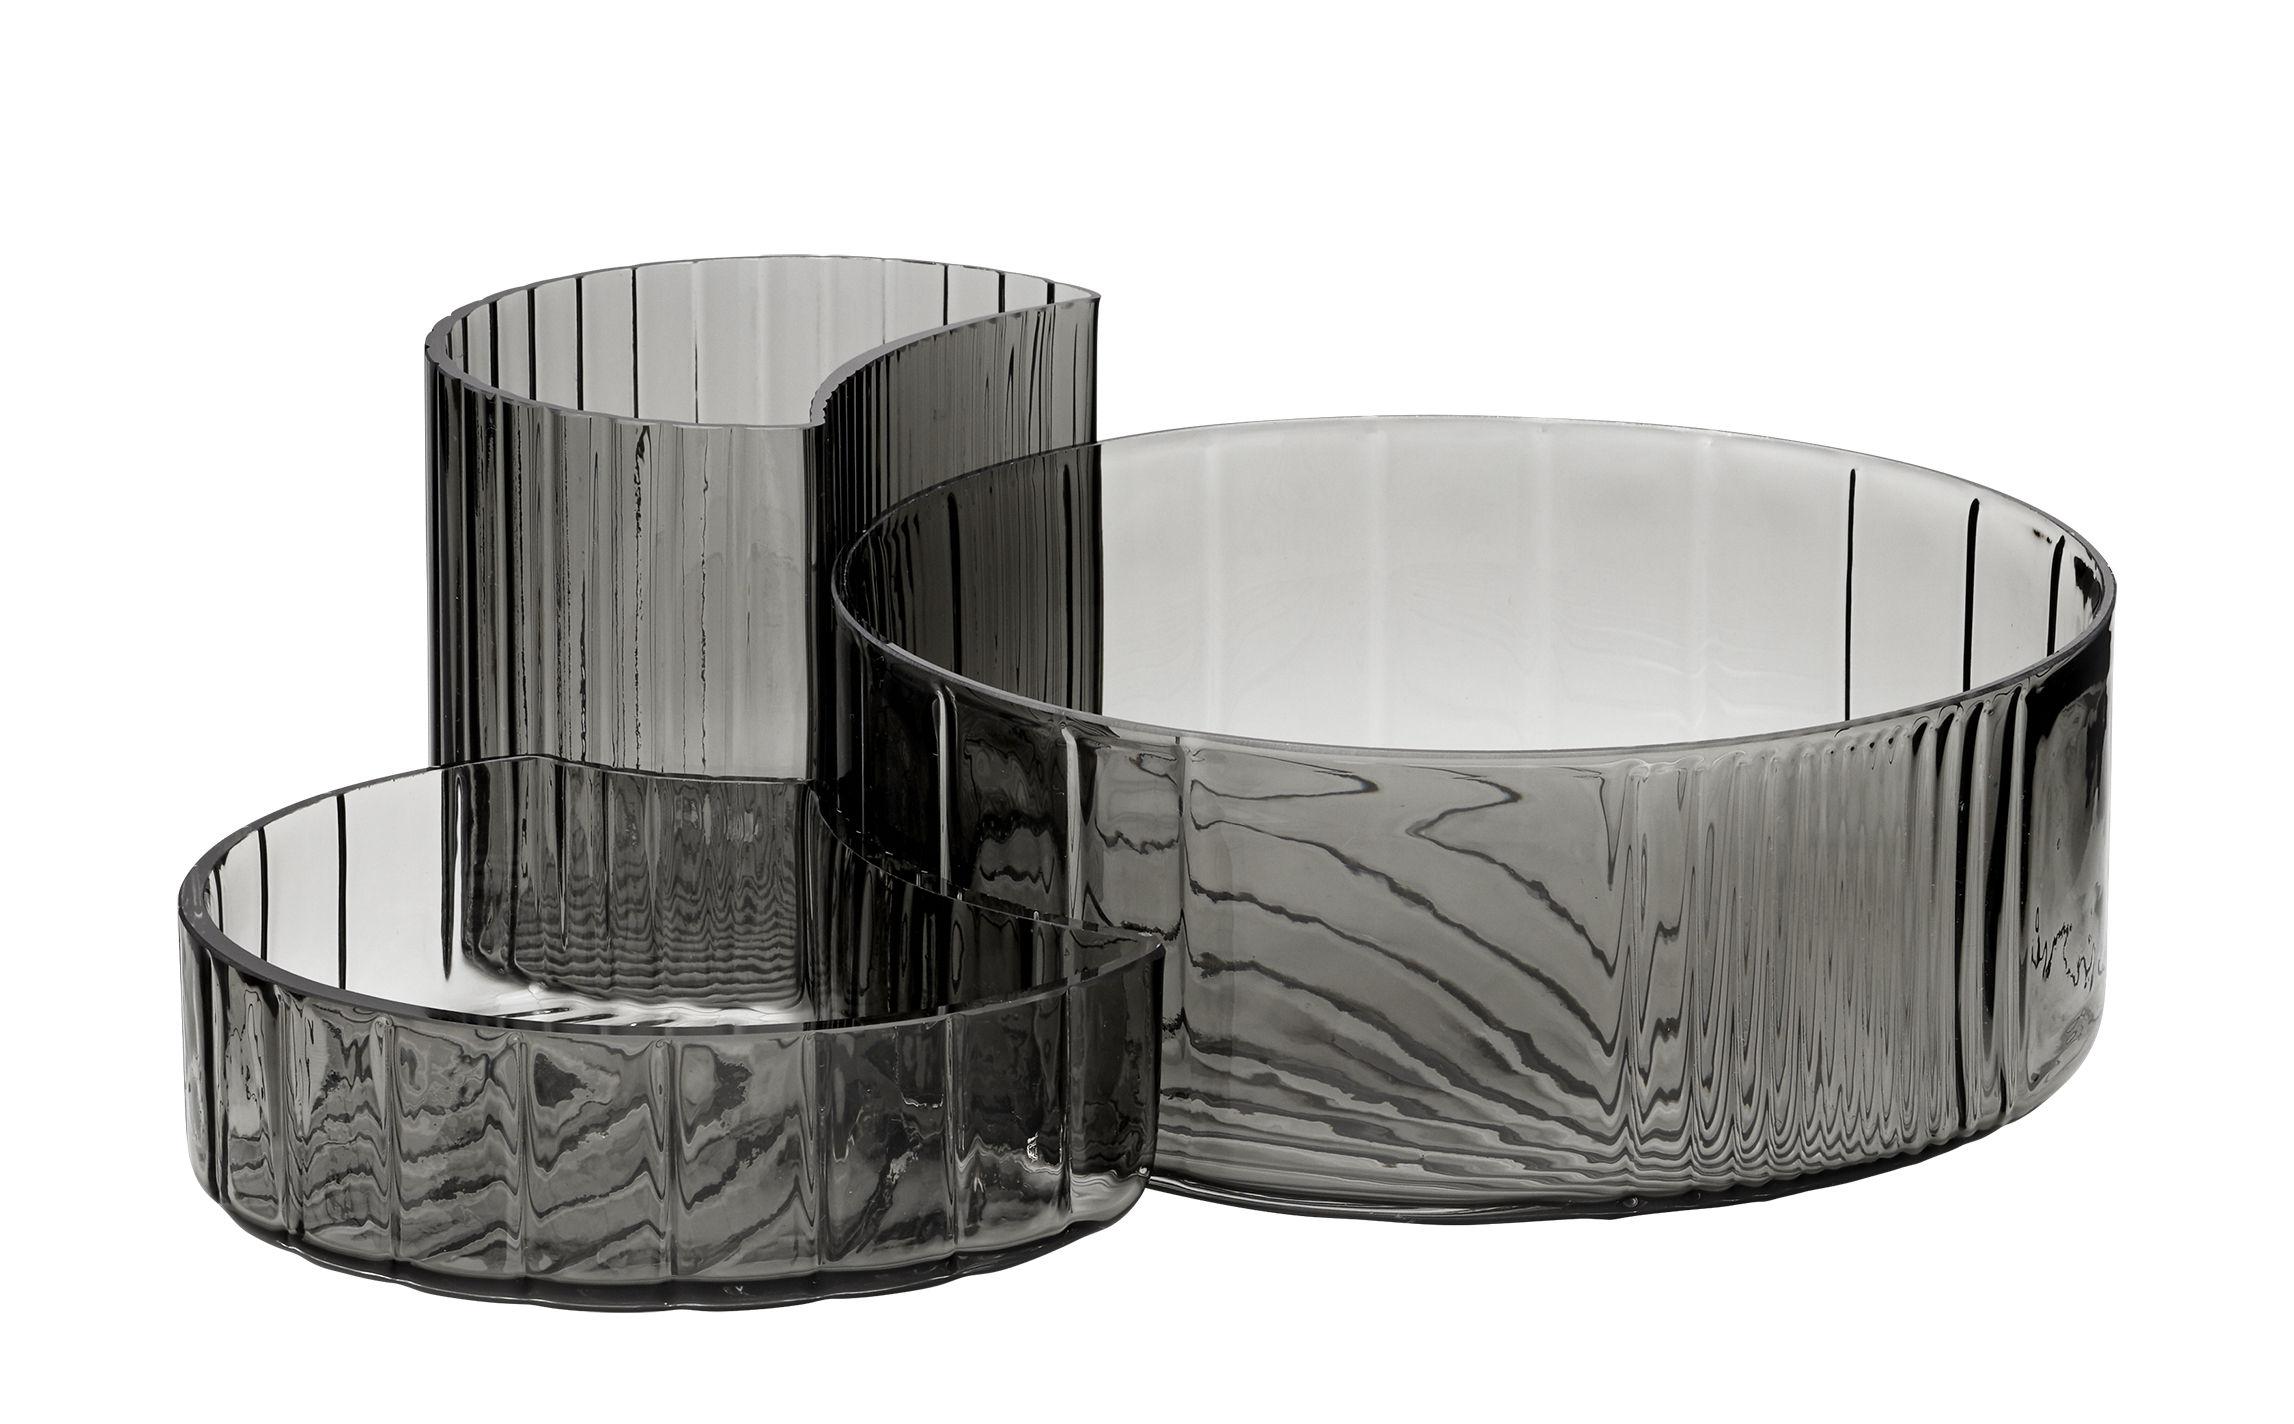 Arts de la table - Saladiers, coupes et bols - Bol Concha / Set de 3 - AYTM - Noir transparent - Verre